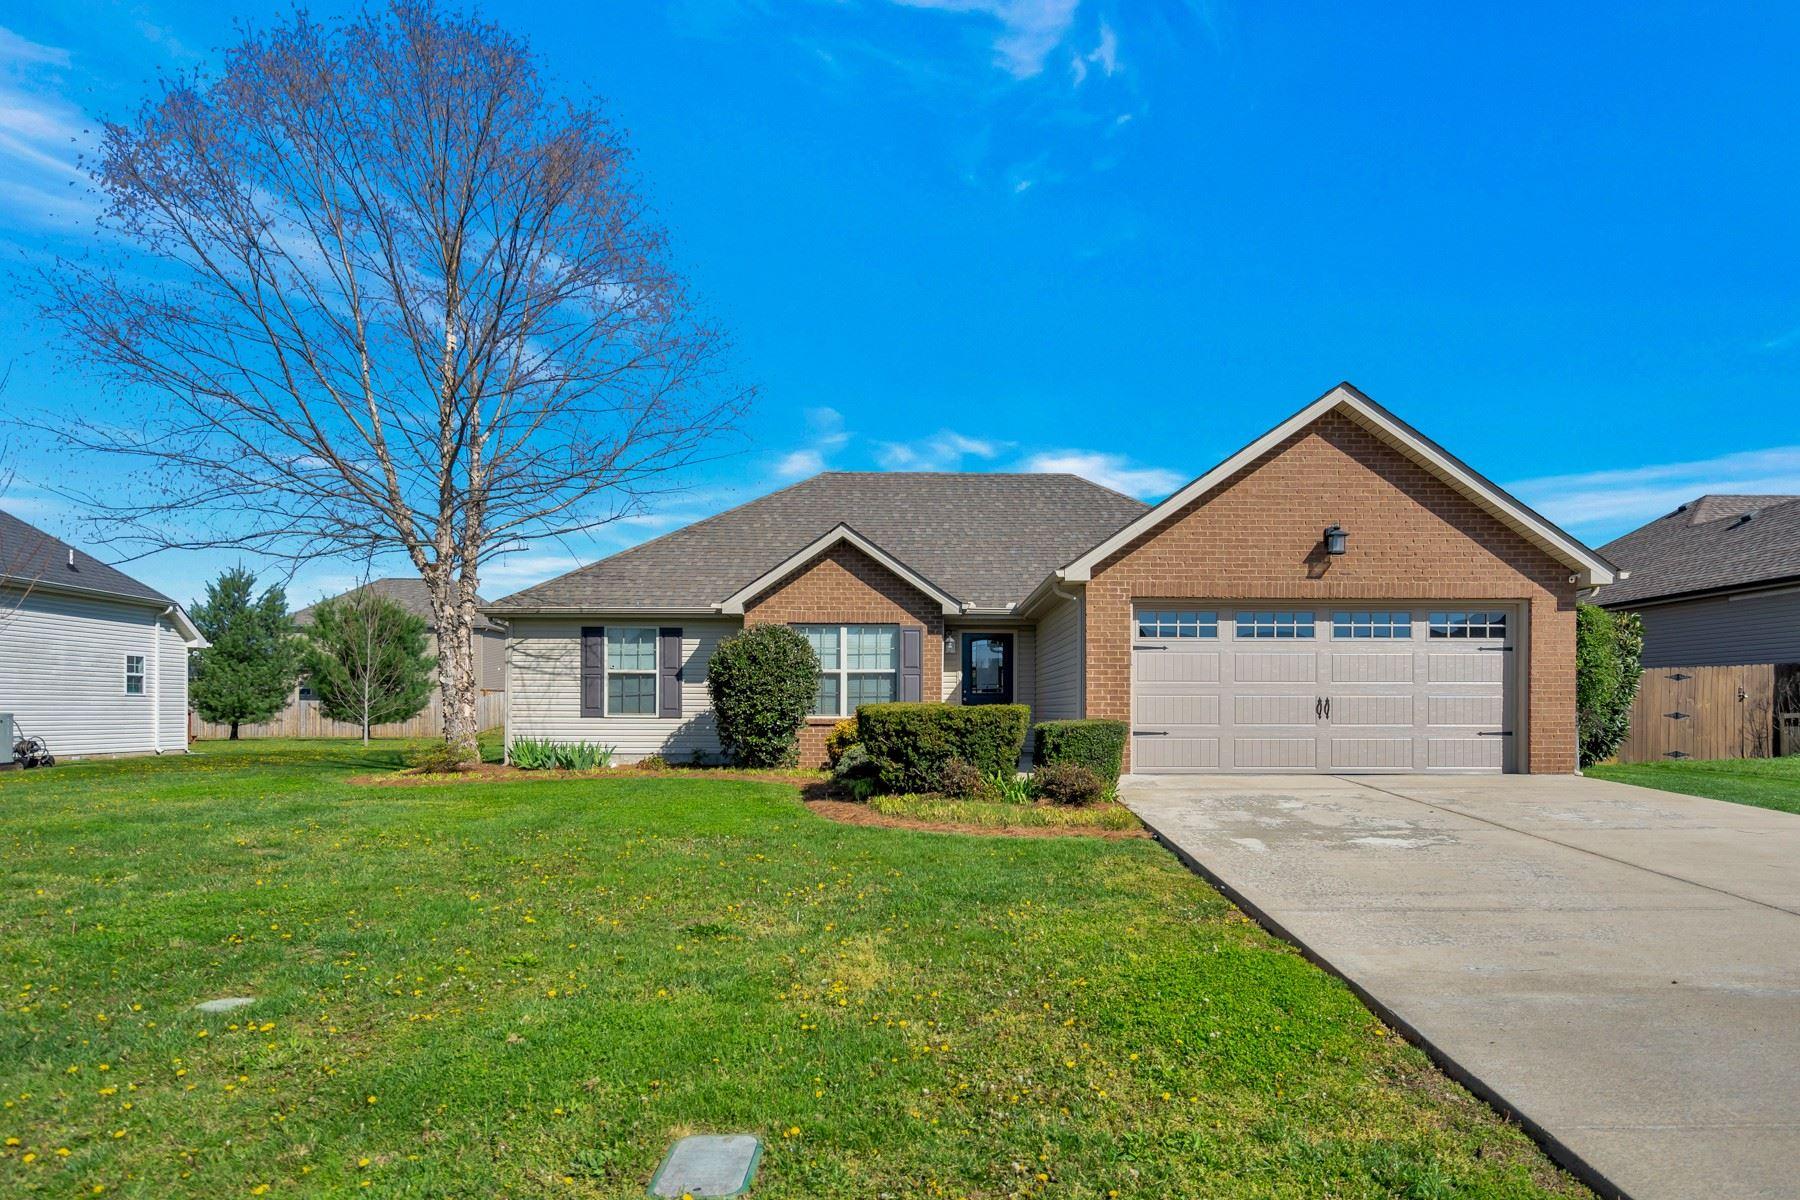 2339 Foxworth Ct, Murfreesboro, TN 37127 - MLS#: 2243468